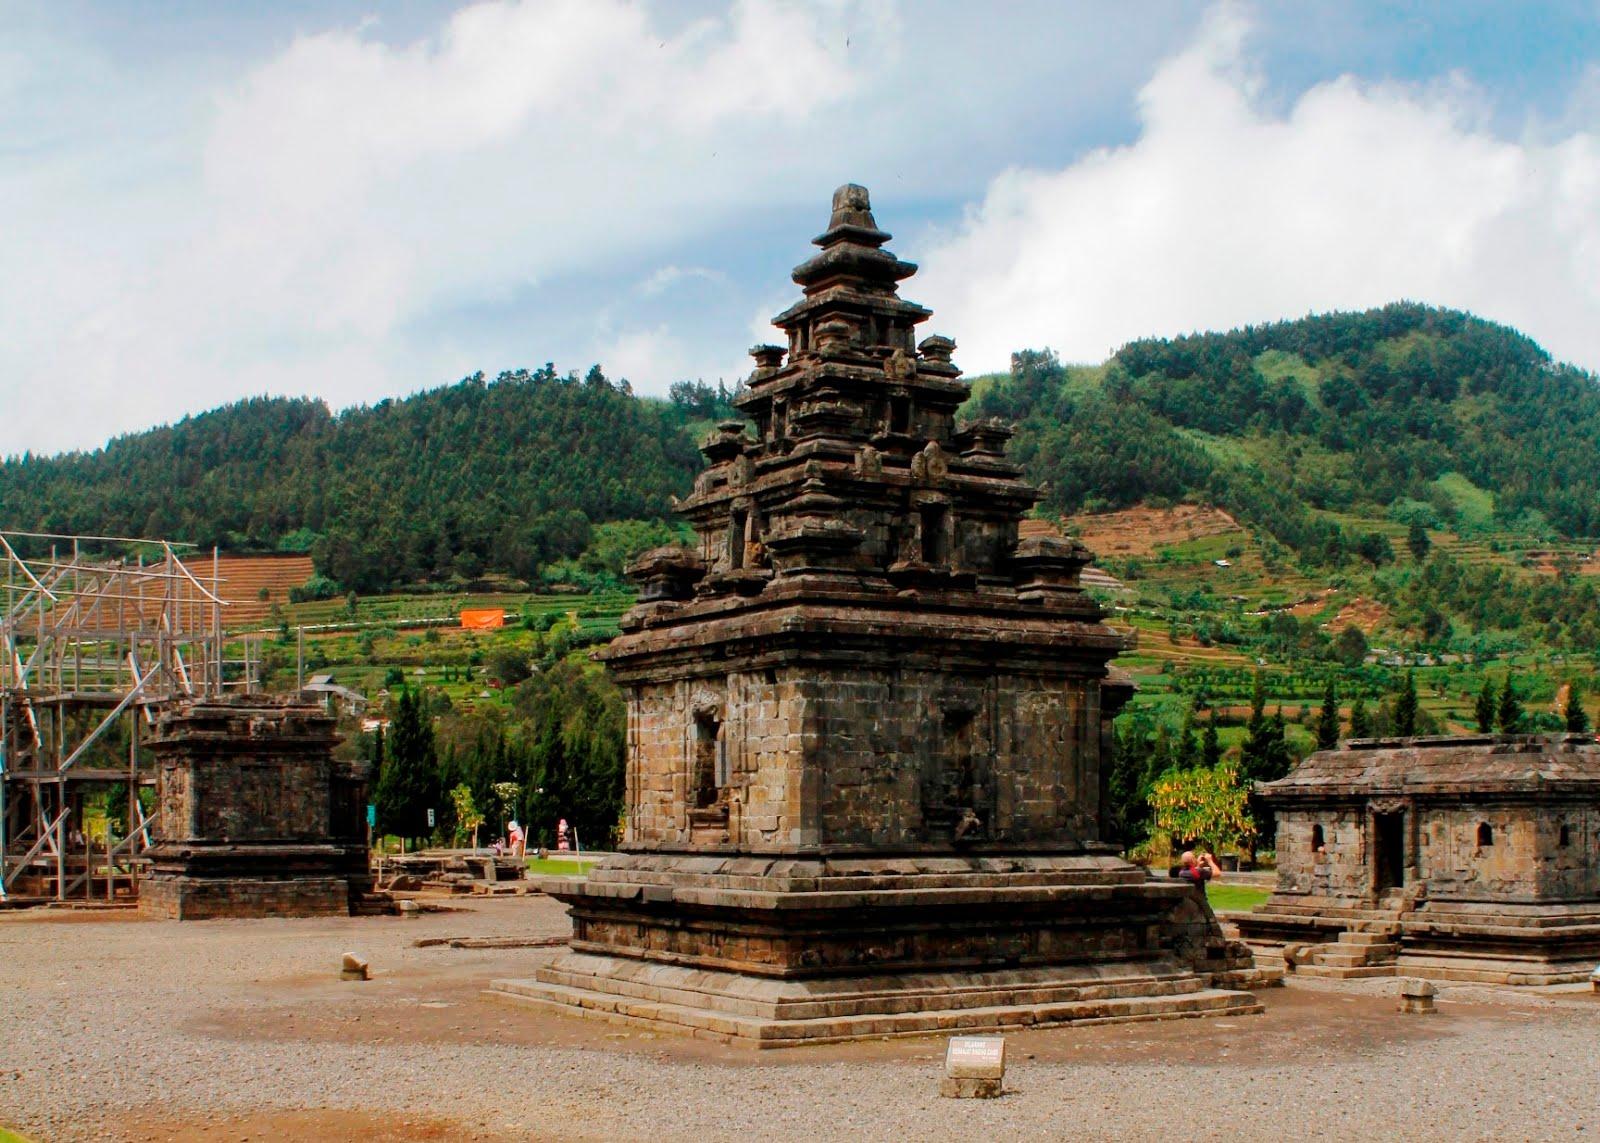 Kompleks Candi Arjuna Banjarnegara Jawa Tengah Dieng Memang Tidak Sebesar